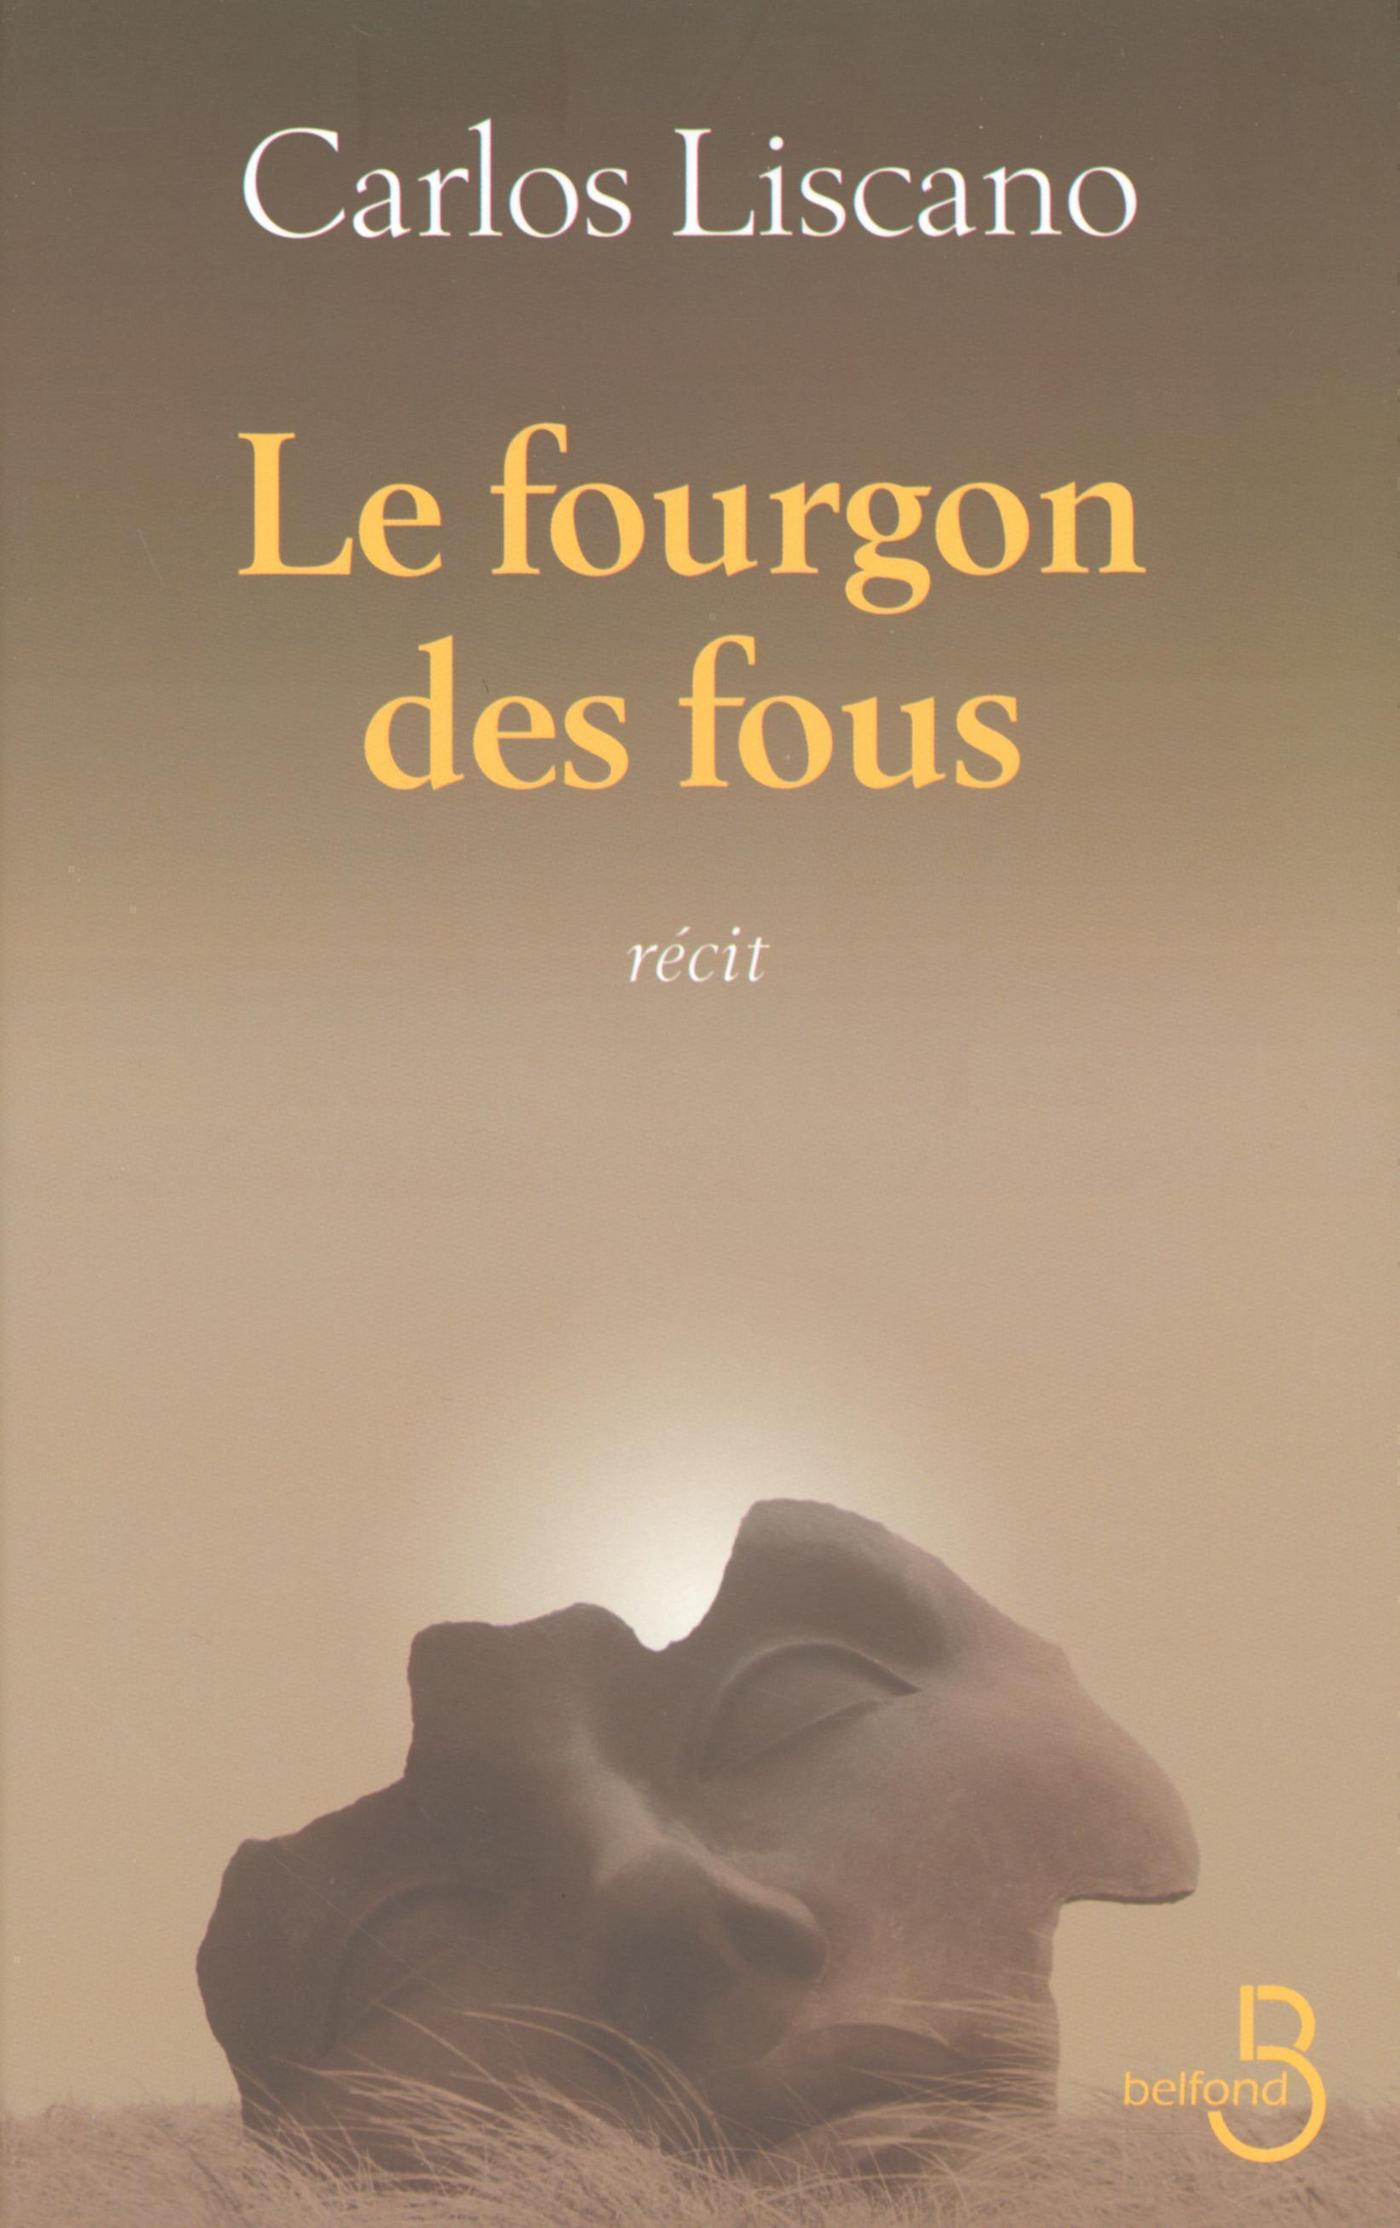 Le fourgon des fous (ebook)